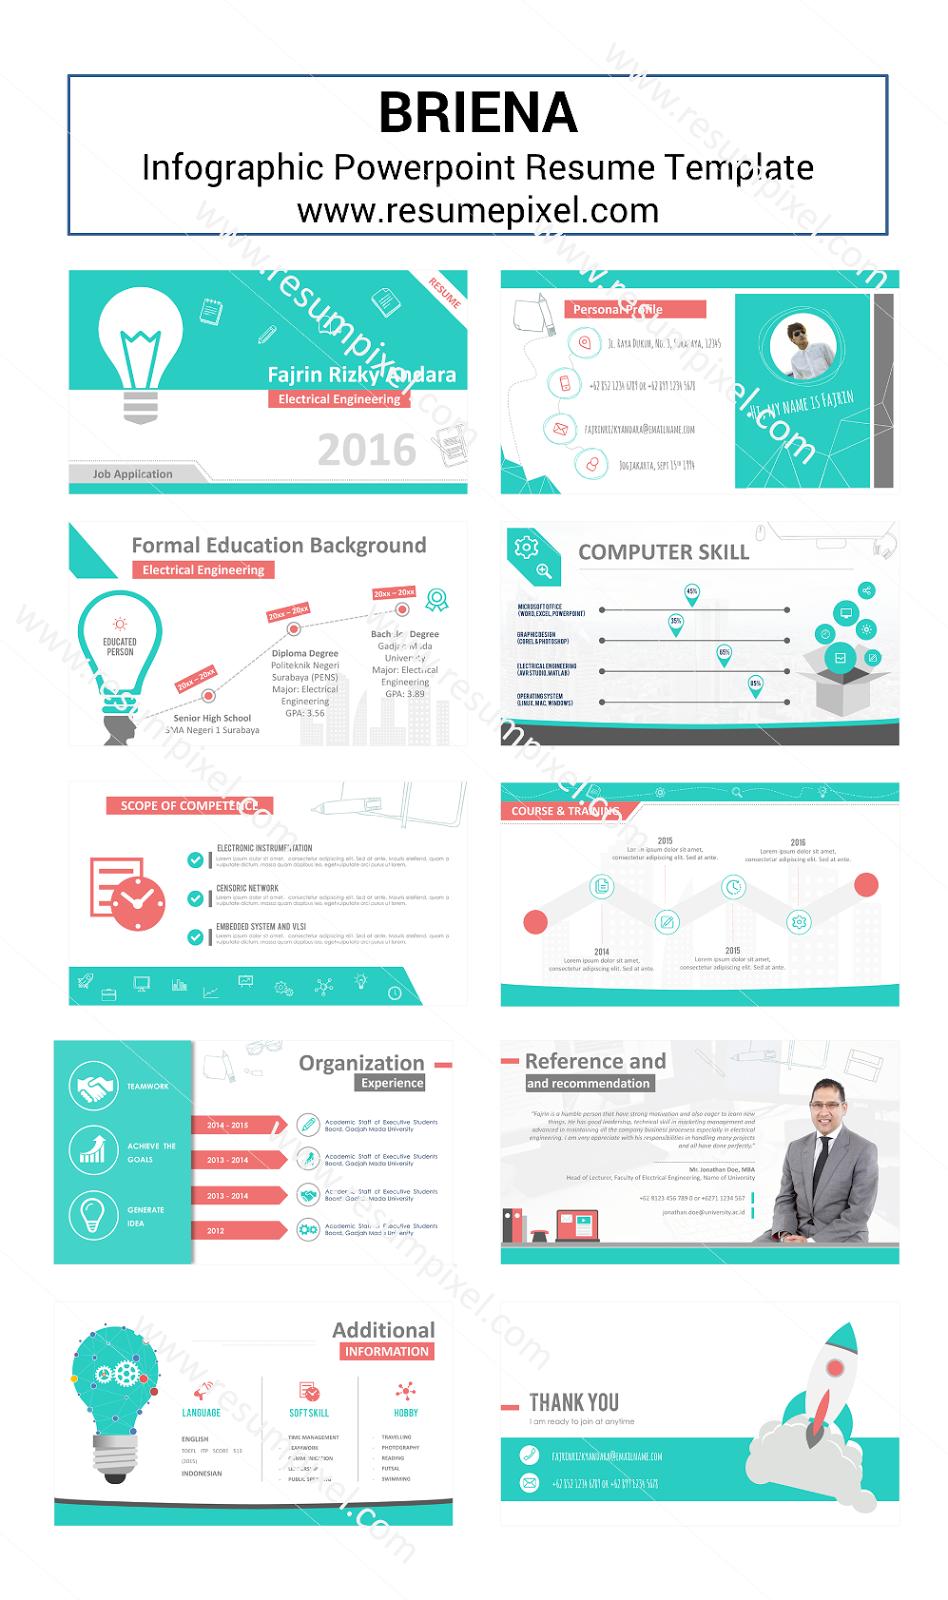 desain cv kreatif contoh cv dan resume powerpoint briena